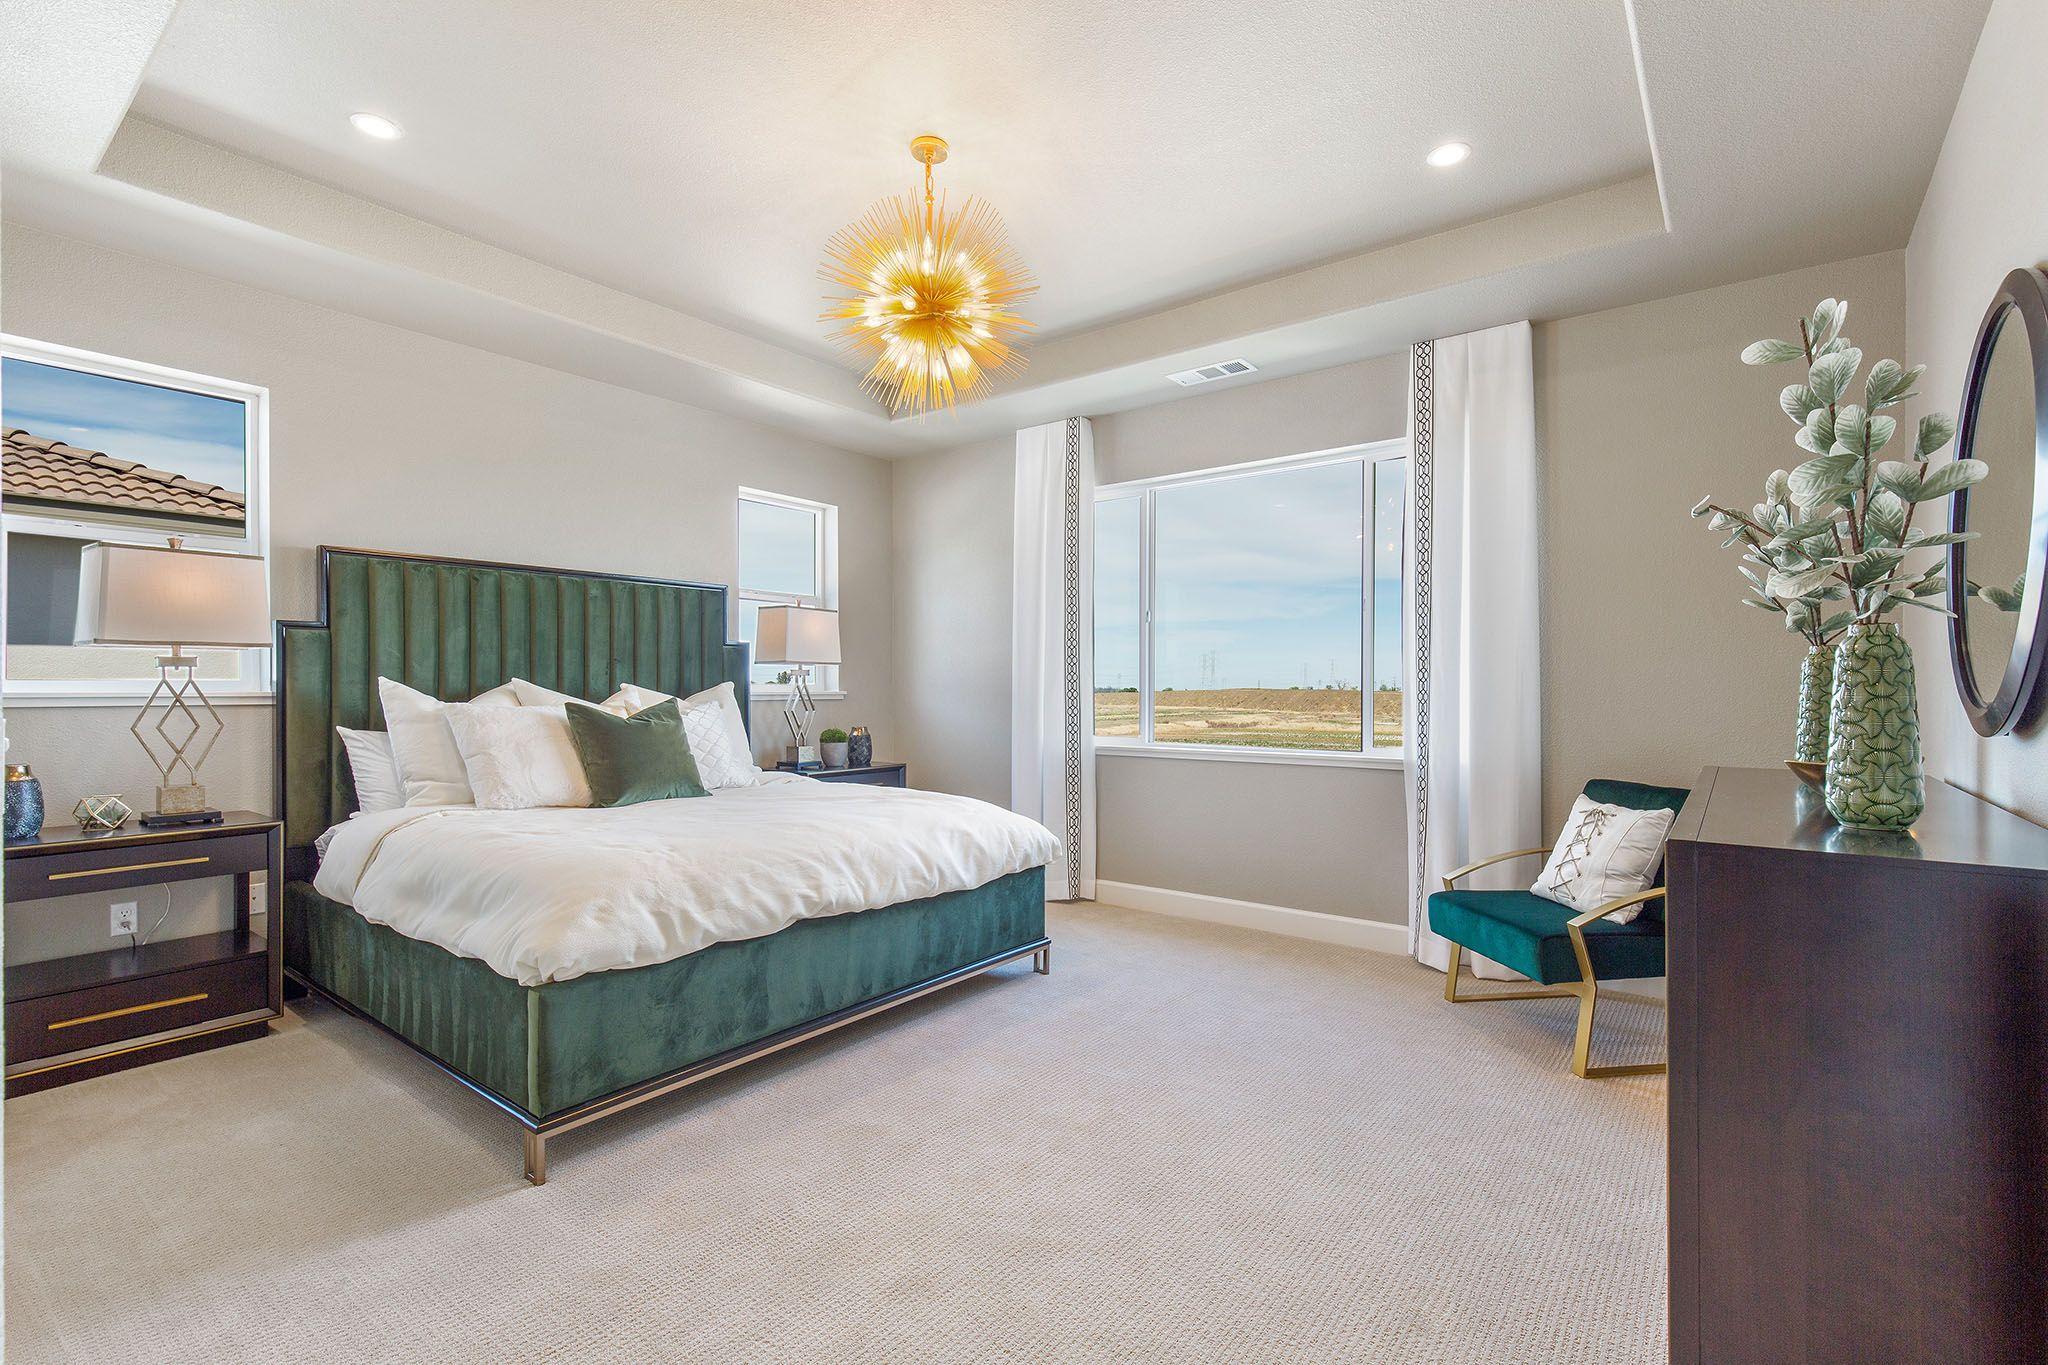 Bedroom featured in the Dalton By Seeno Homes in Vallejo-Napa, CA